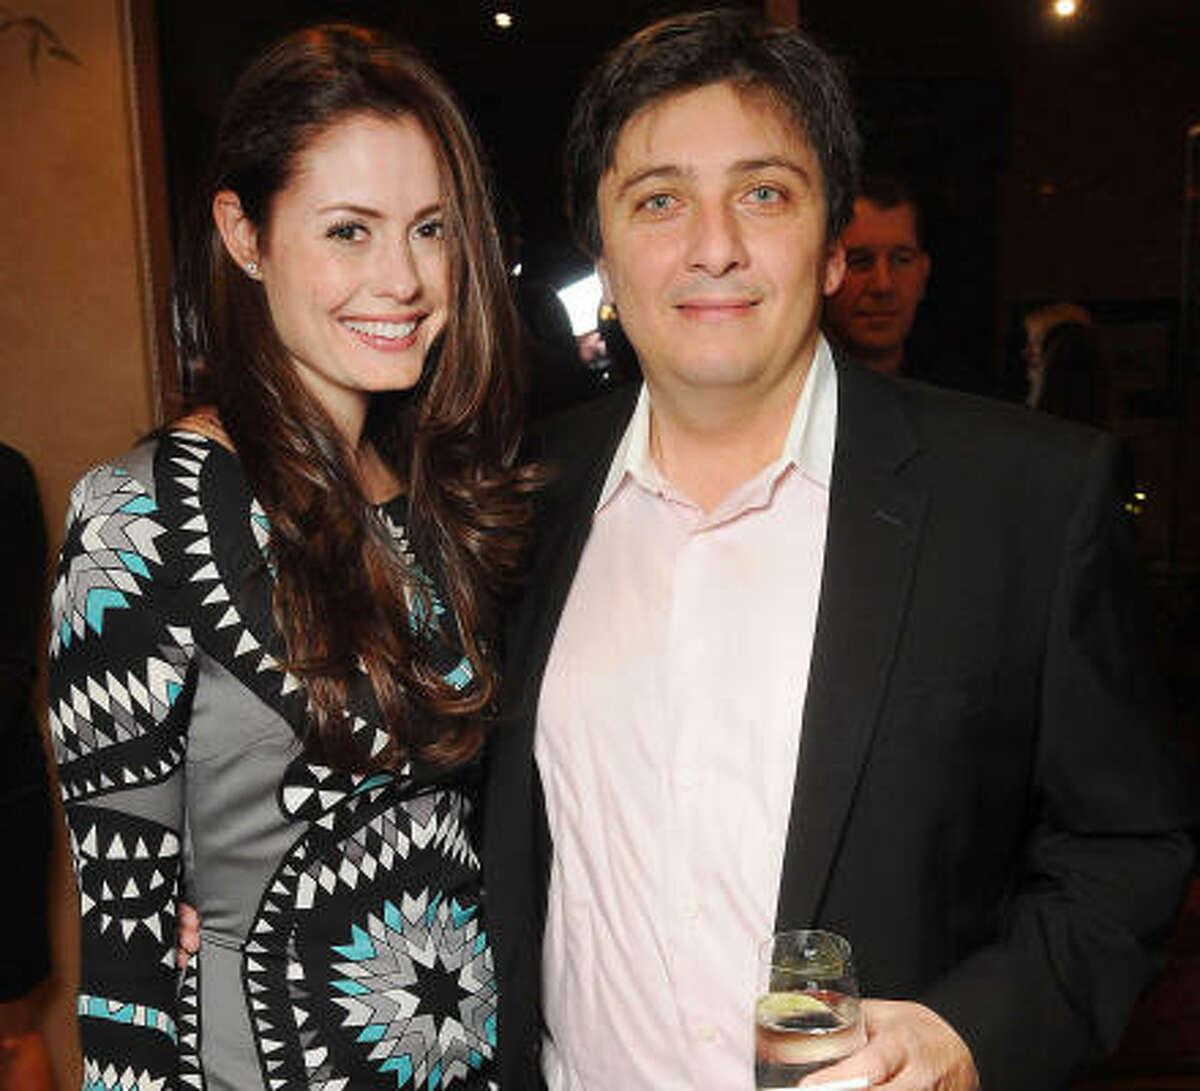 Christin and Ugo Tombolini